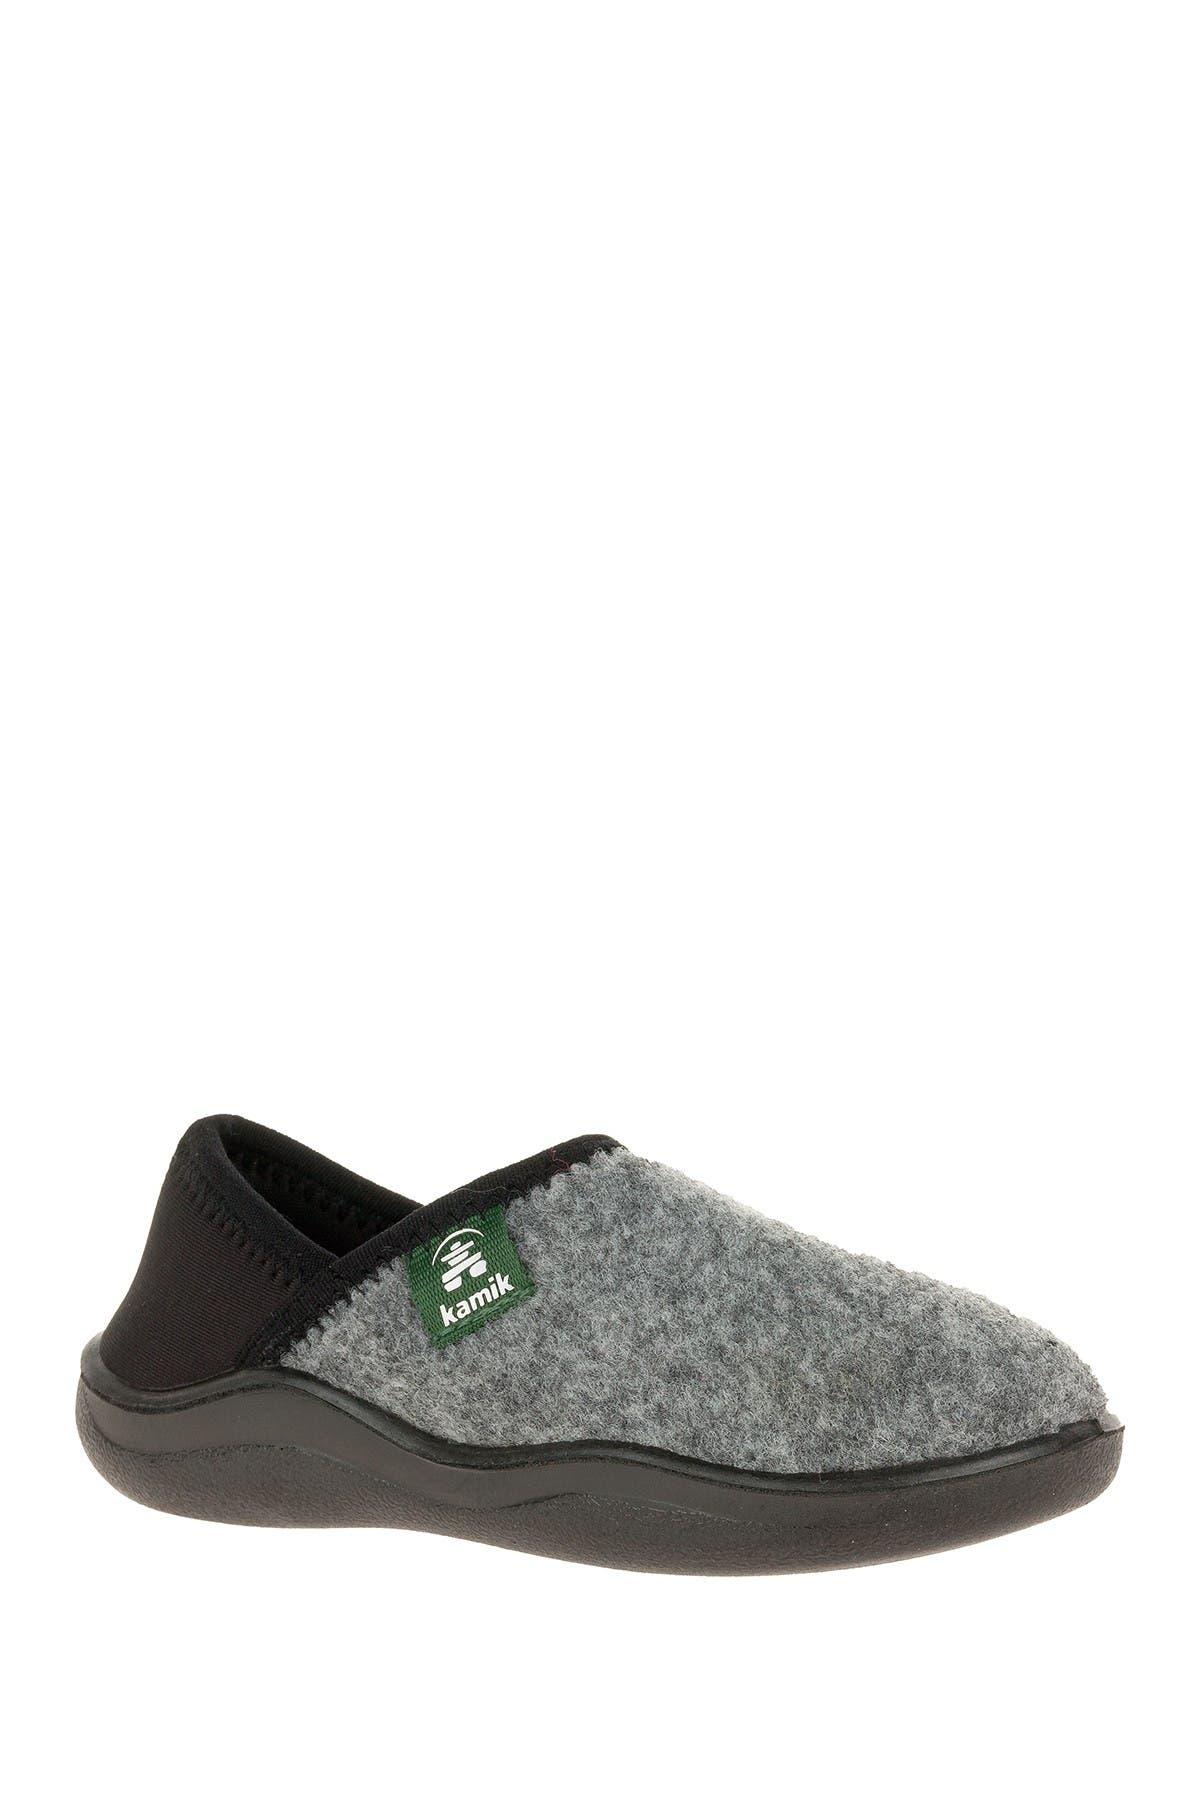 Image of Kamik Cozytime Slipper